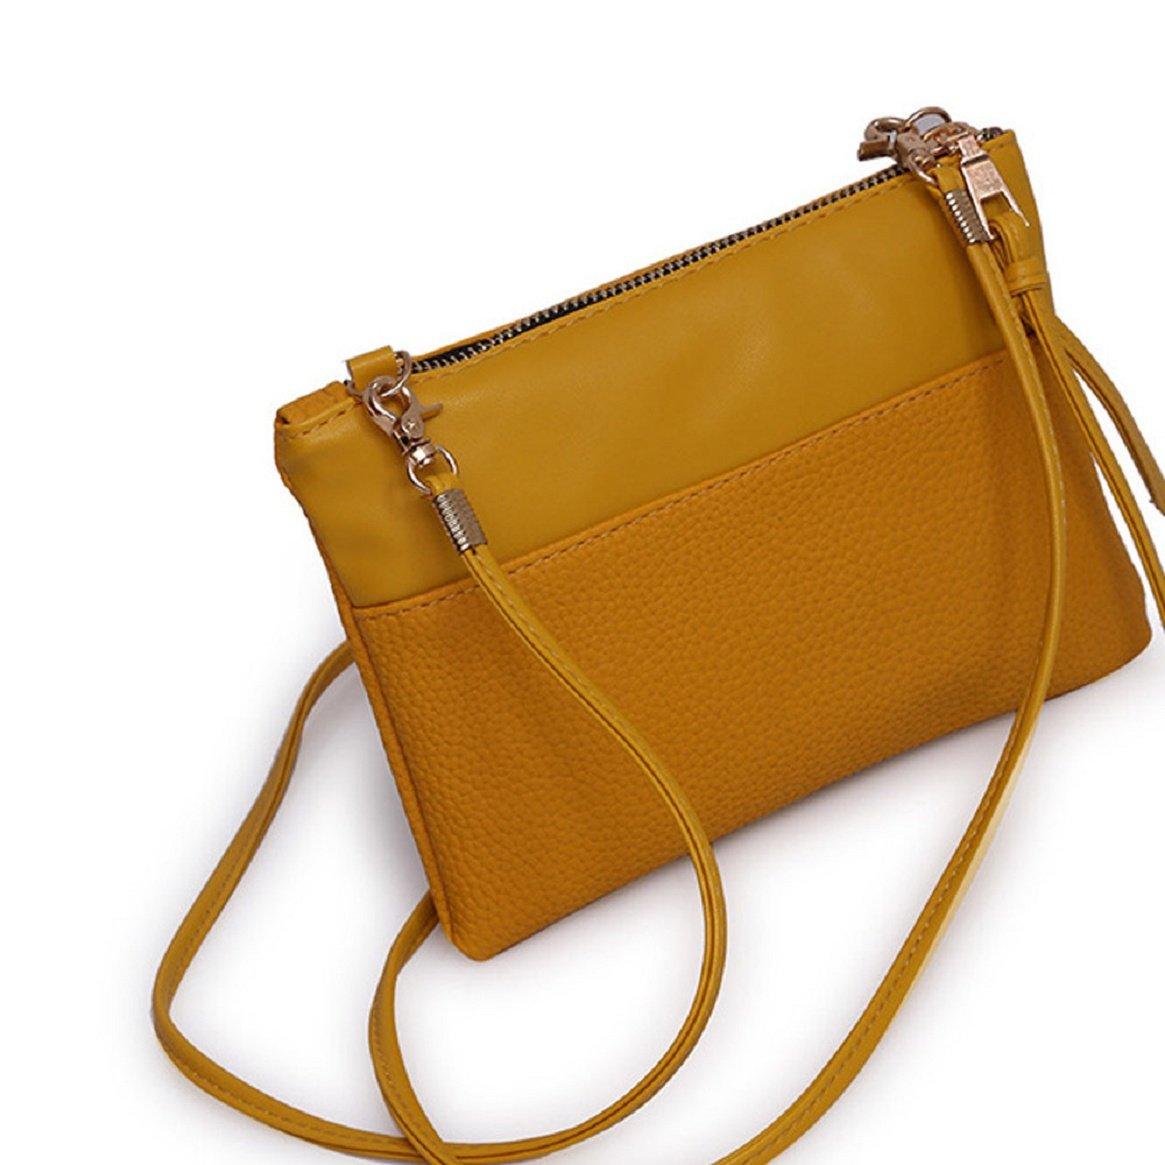 Clearance Items Coerni Women Zipper Shoulder Bag PU Leather (Brown) by Coerni (Image #2)